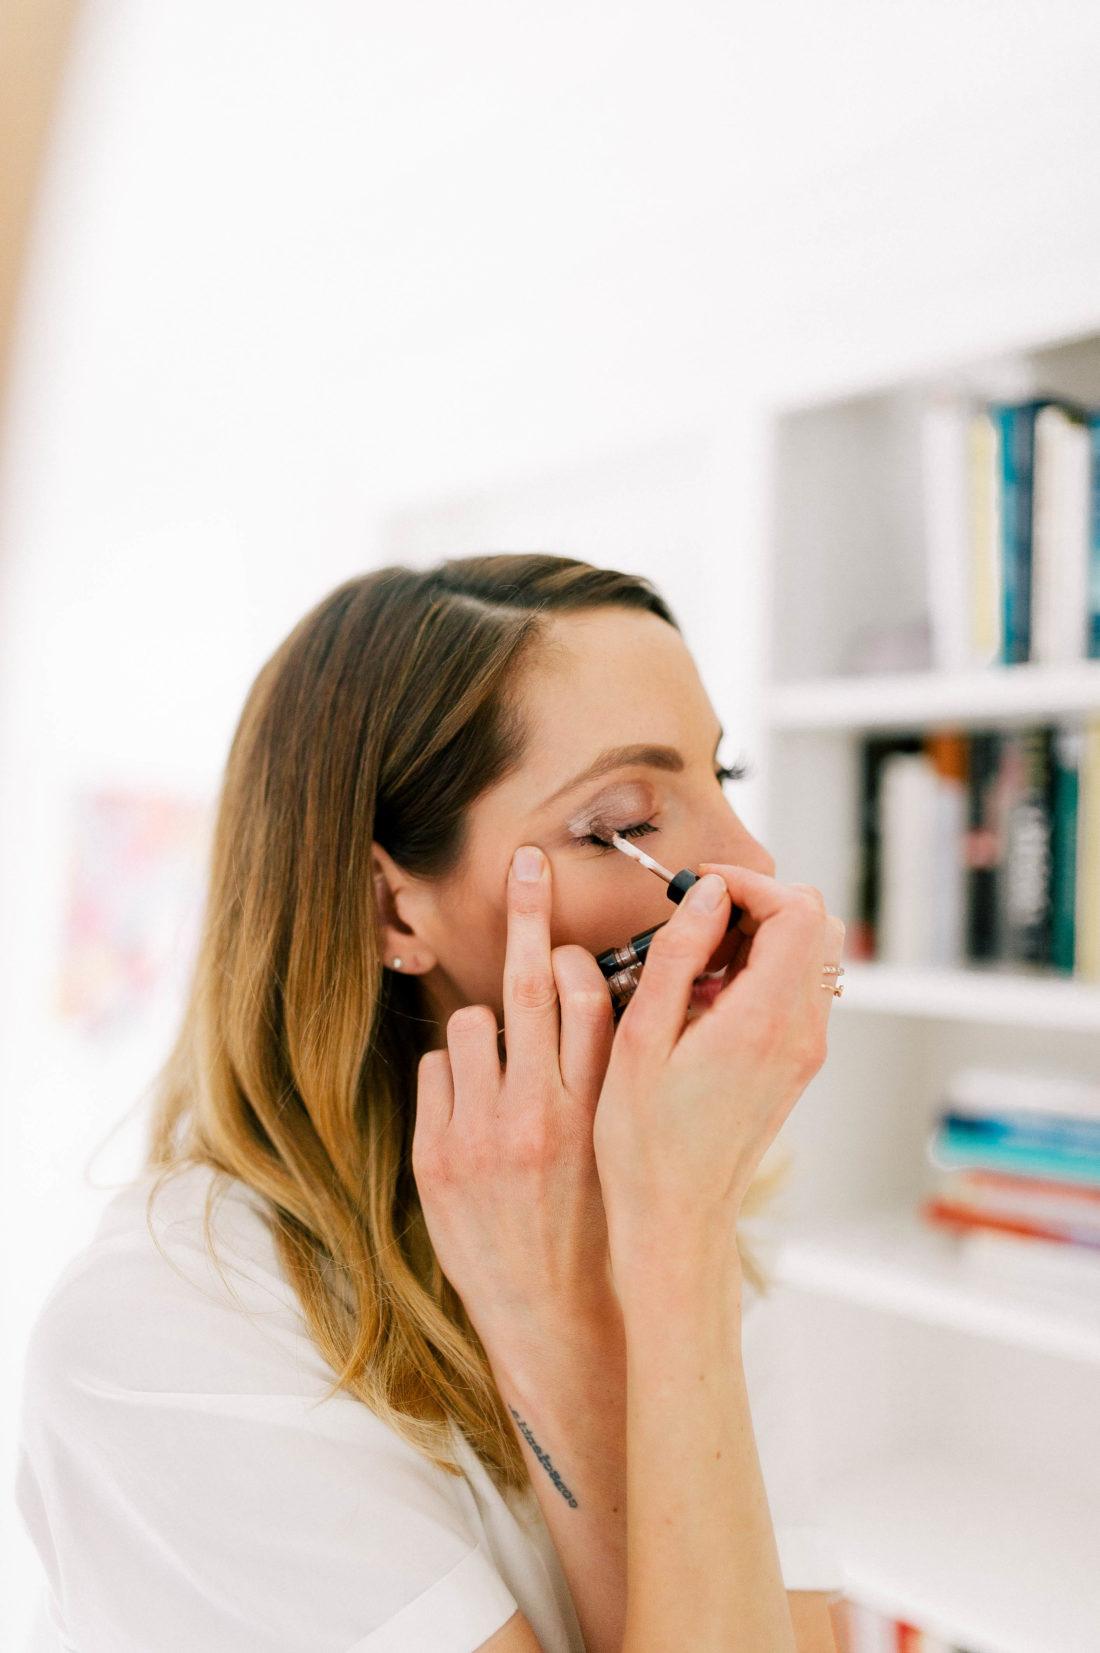 Eva Amurri Martino applies metallic liquid shimmer shadow to her eyelids to demonstrate one of her favorite holiday makeup looks